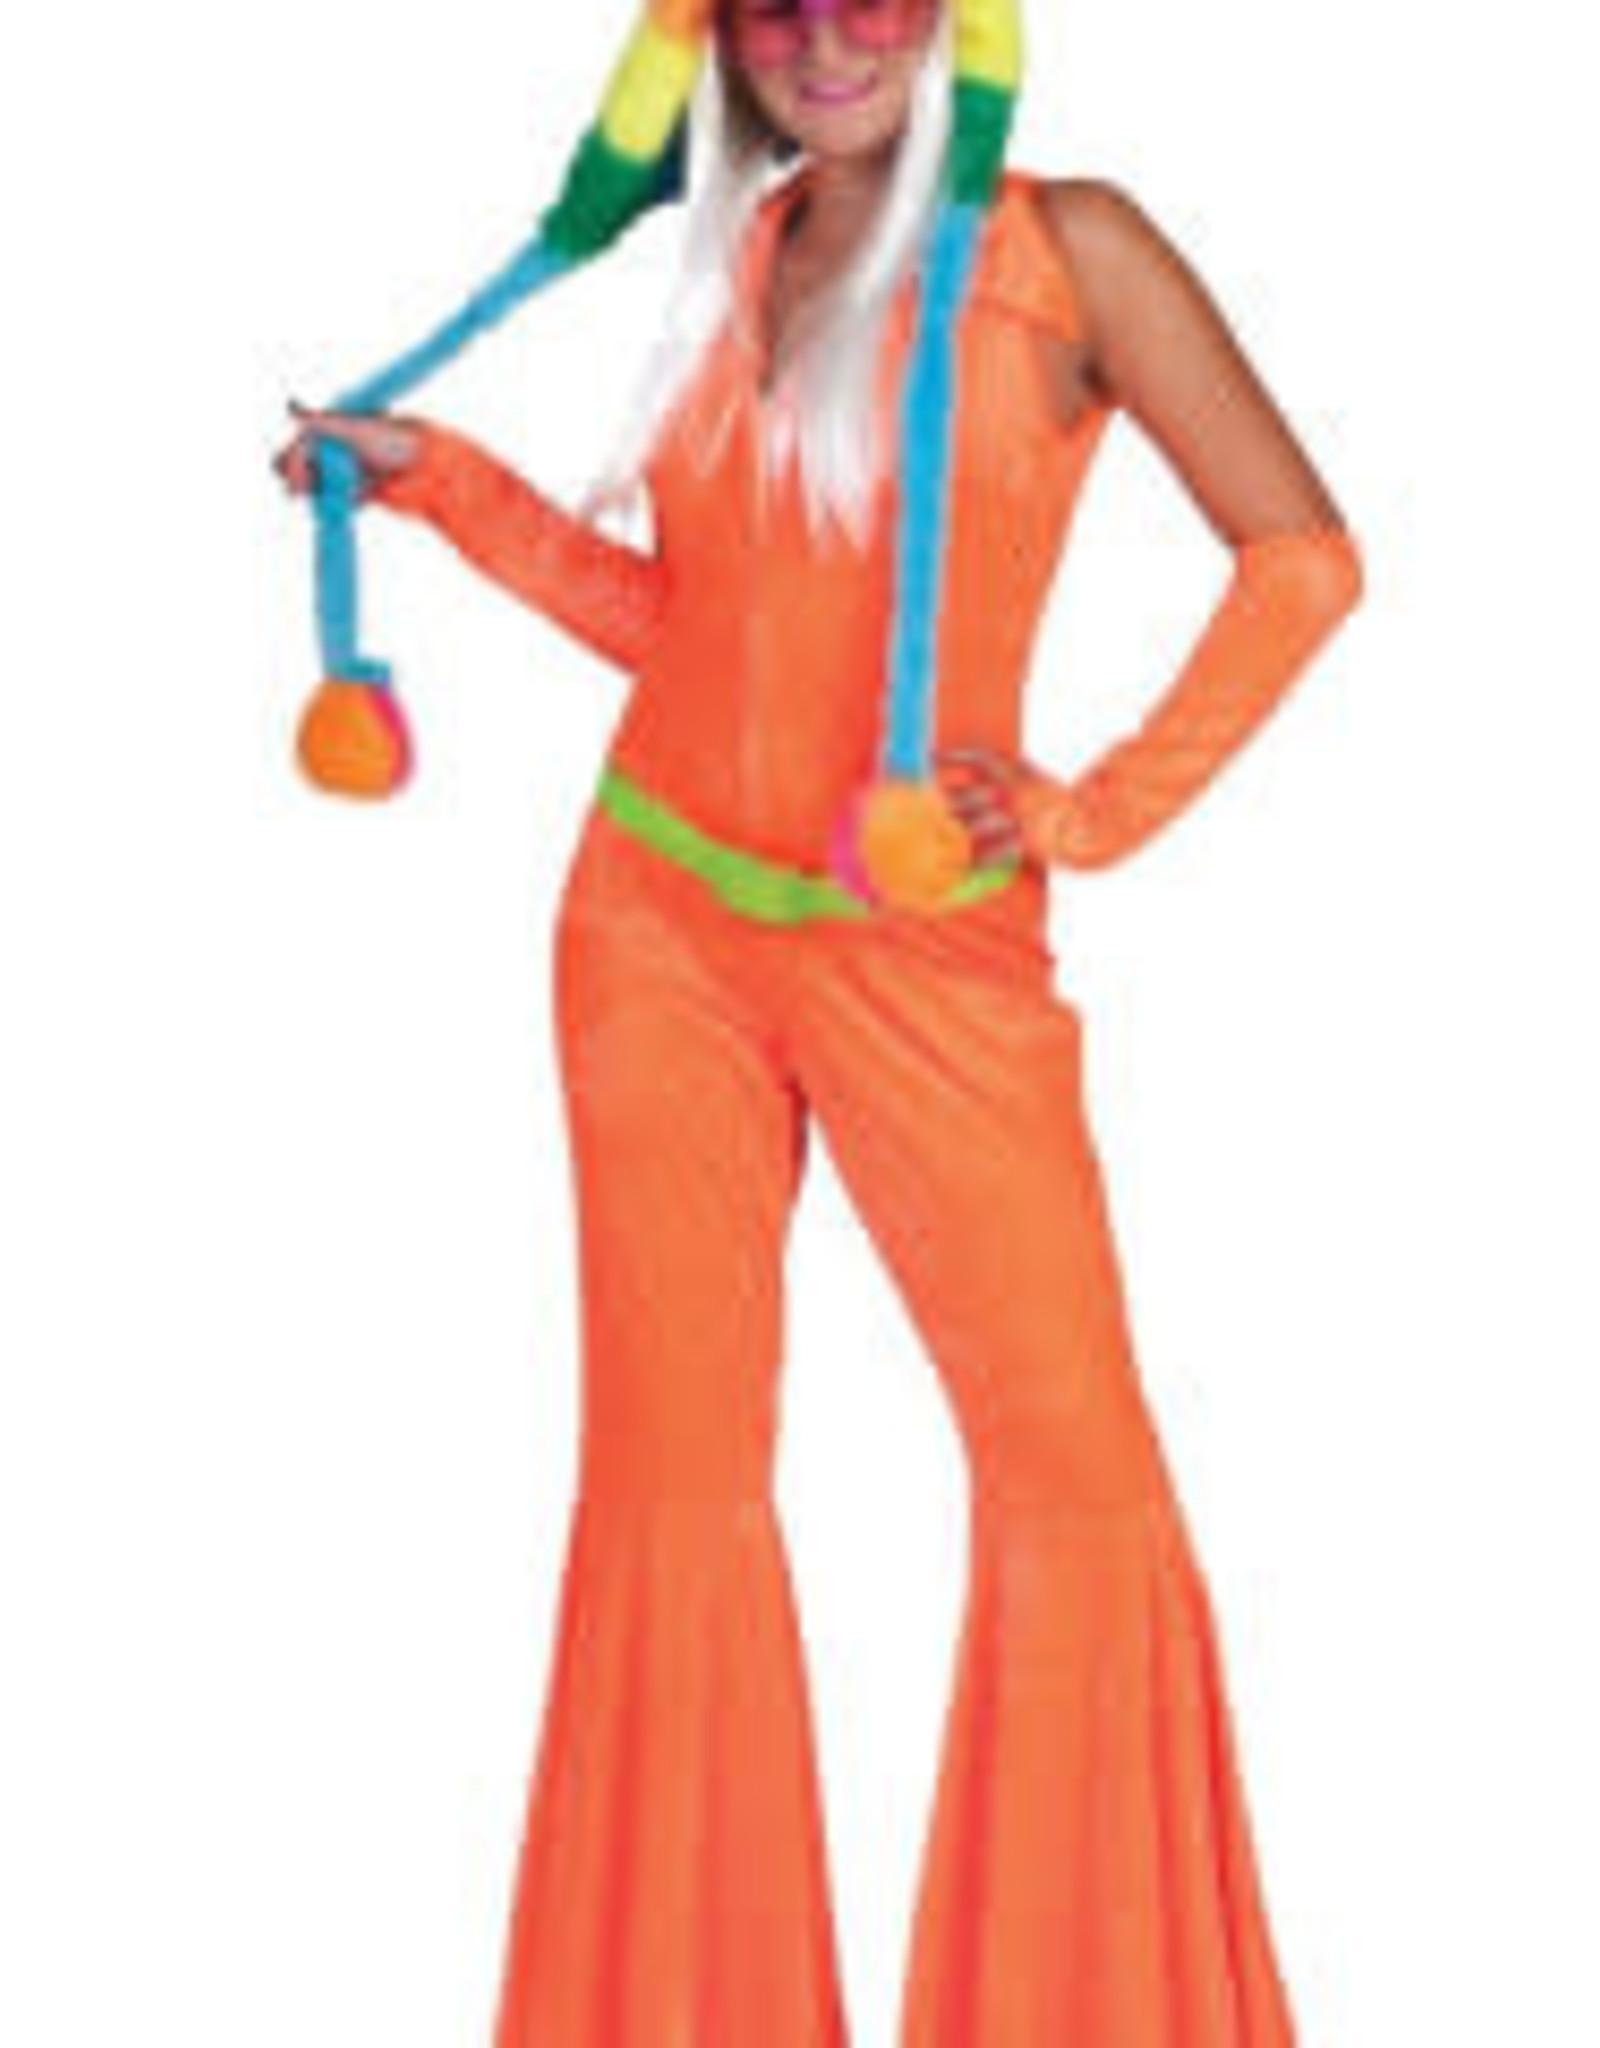 ESPA Jump Neon Kleur Oranje huurprijs 15